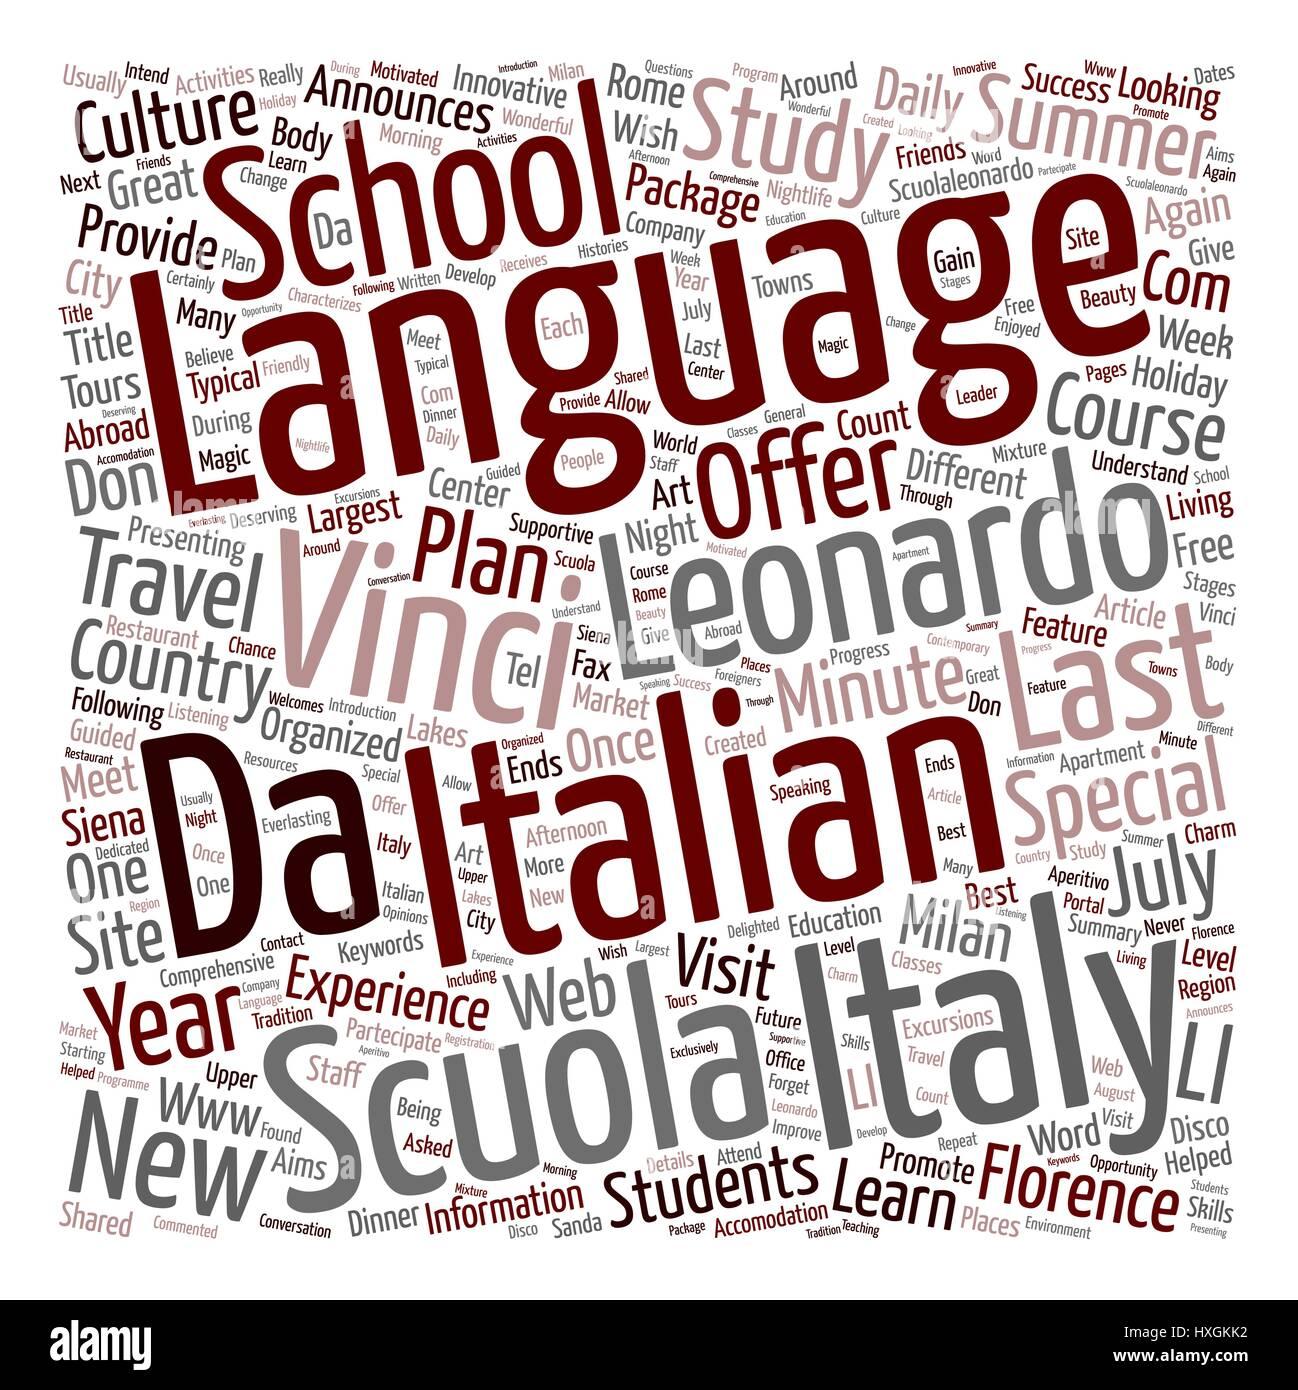 Scuola Leonardo Da Vinci Announces The New Last Minute Special Offers For Summer text background wordcloud concept - Stock Vector